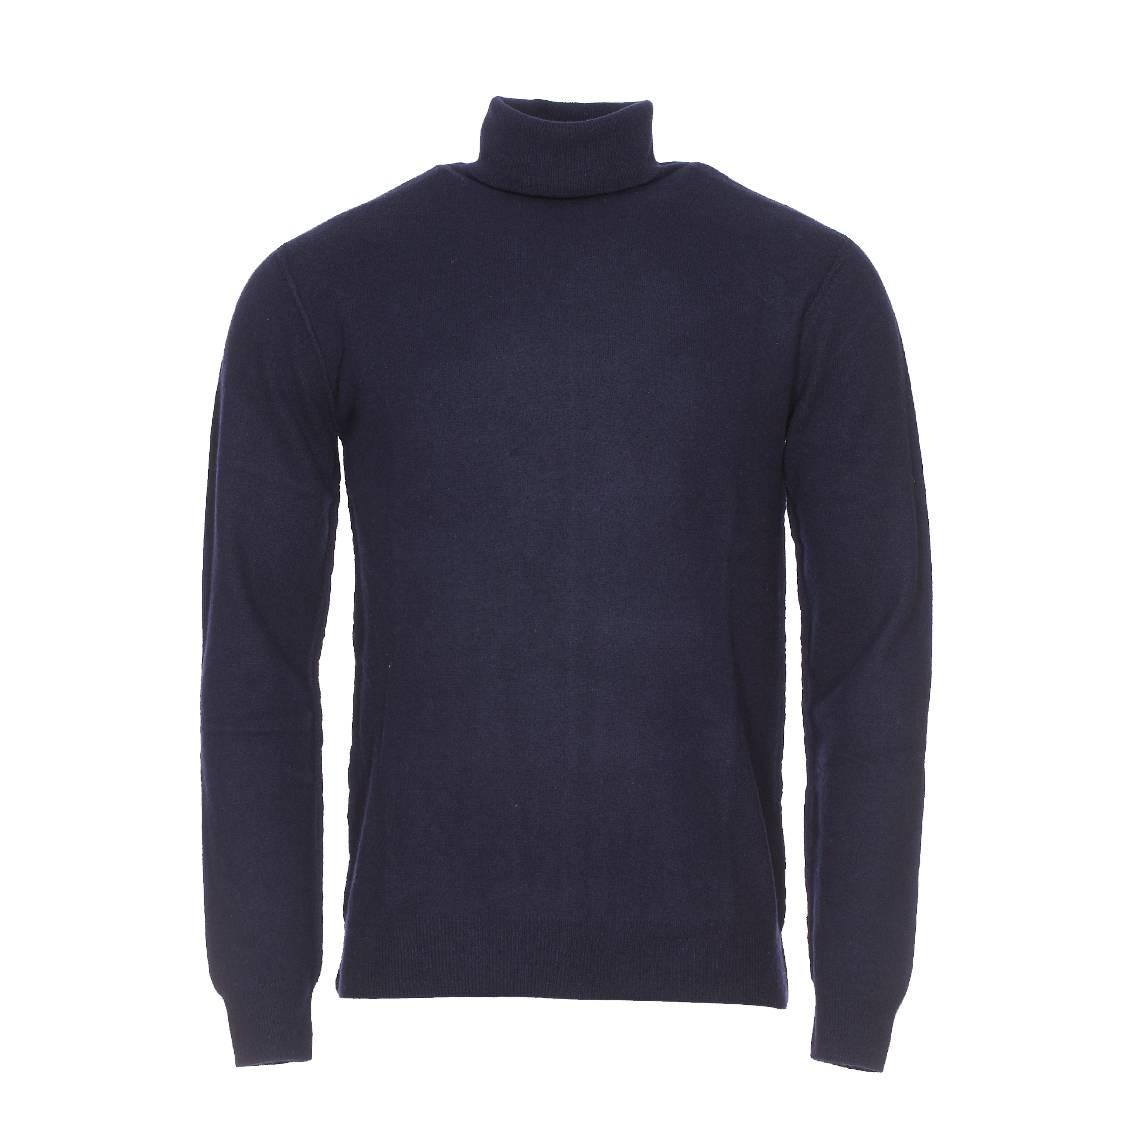 Pull apyroad  en laine bleu marine